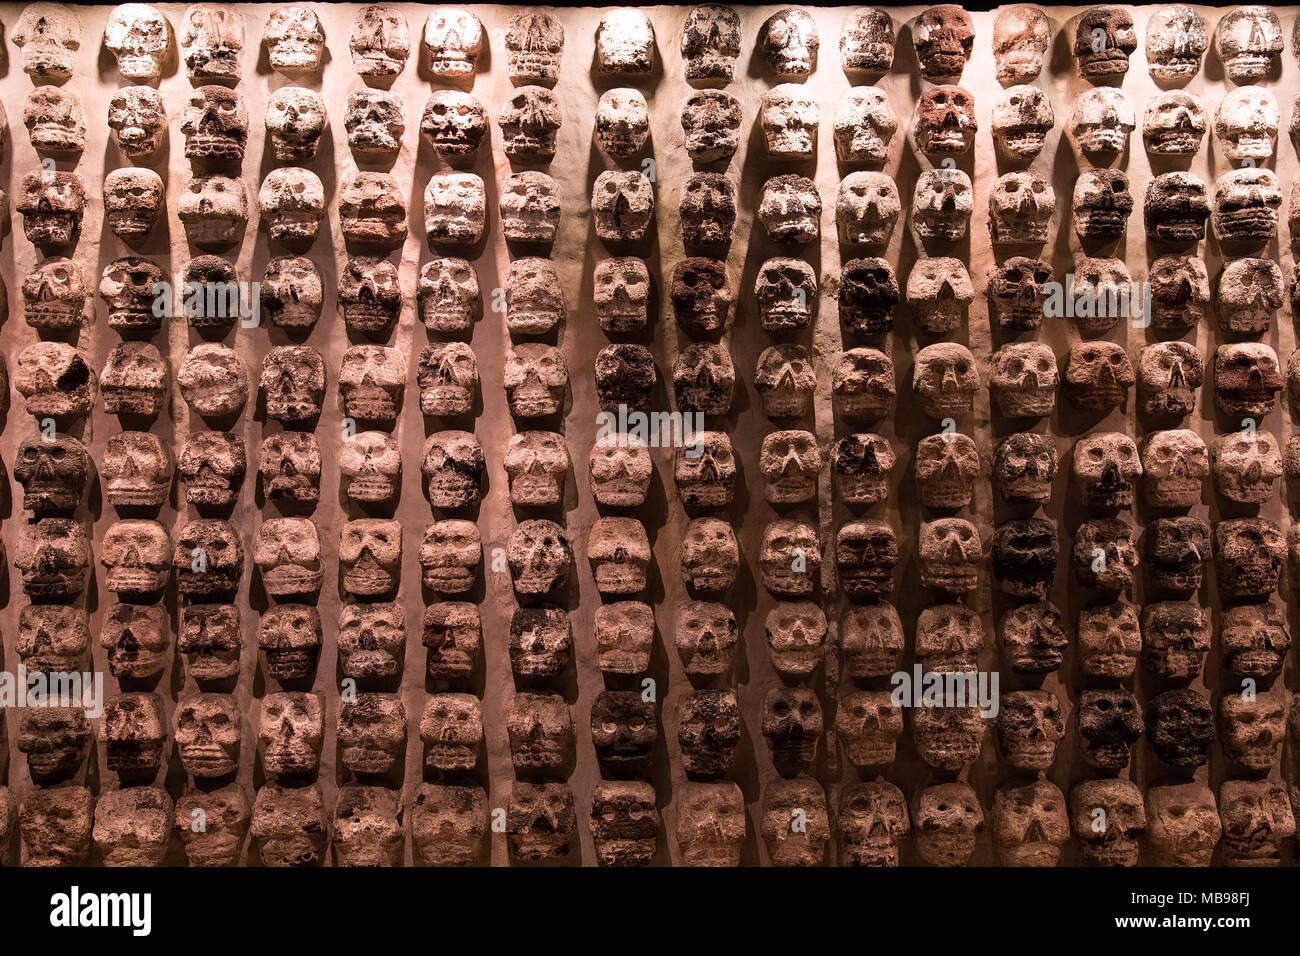 "Aztec Human Skull Sculptures in Museum ""del Templo Mayor"", Mexico City (Tzompantli) Stock Photo"